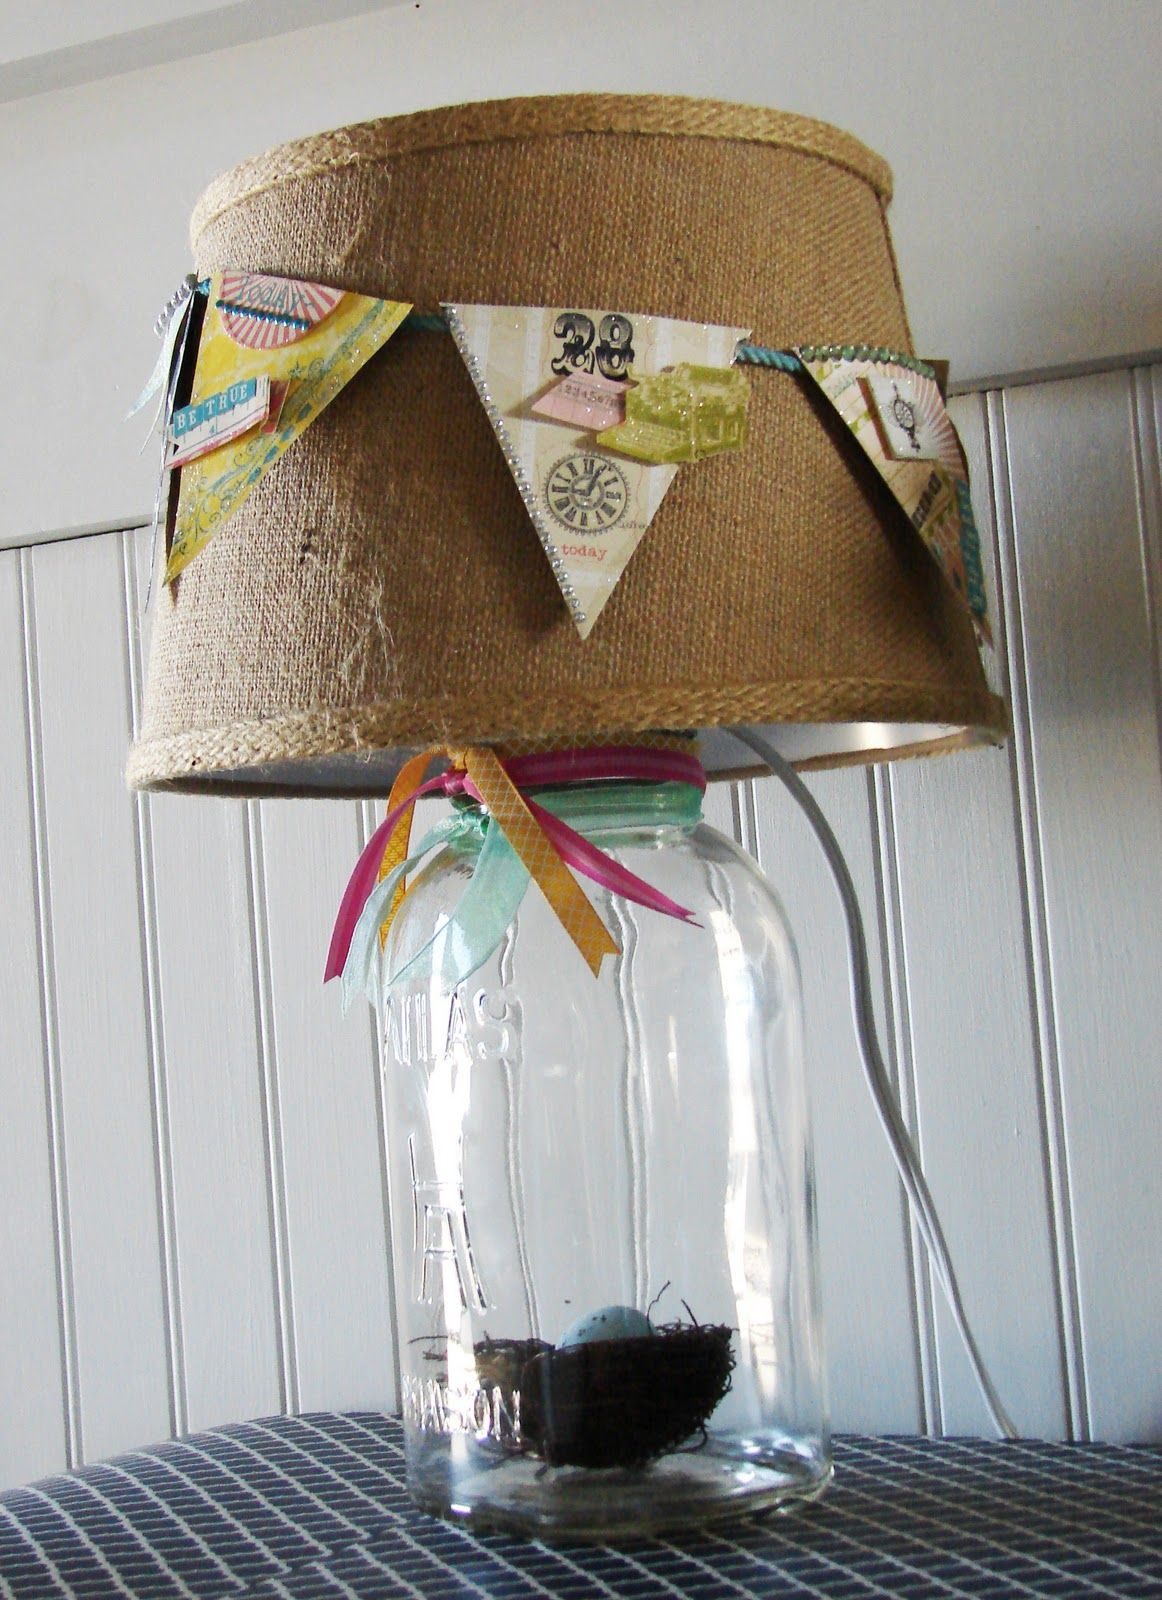 Spring Banner Lampshade Jar Crafts Mason Jar Crafts Homemade Lamps